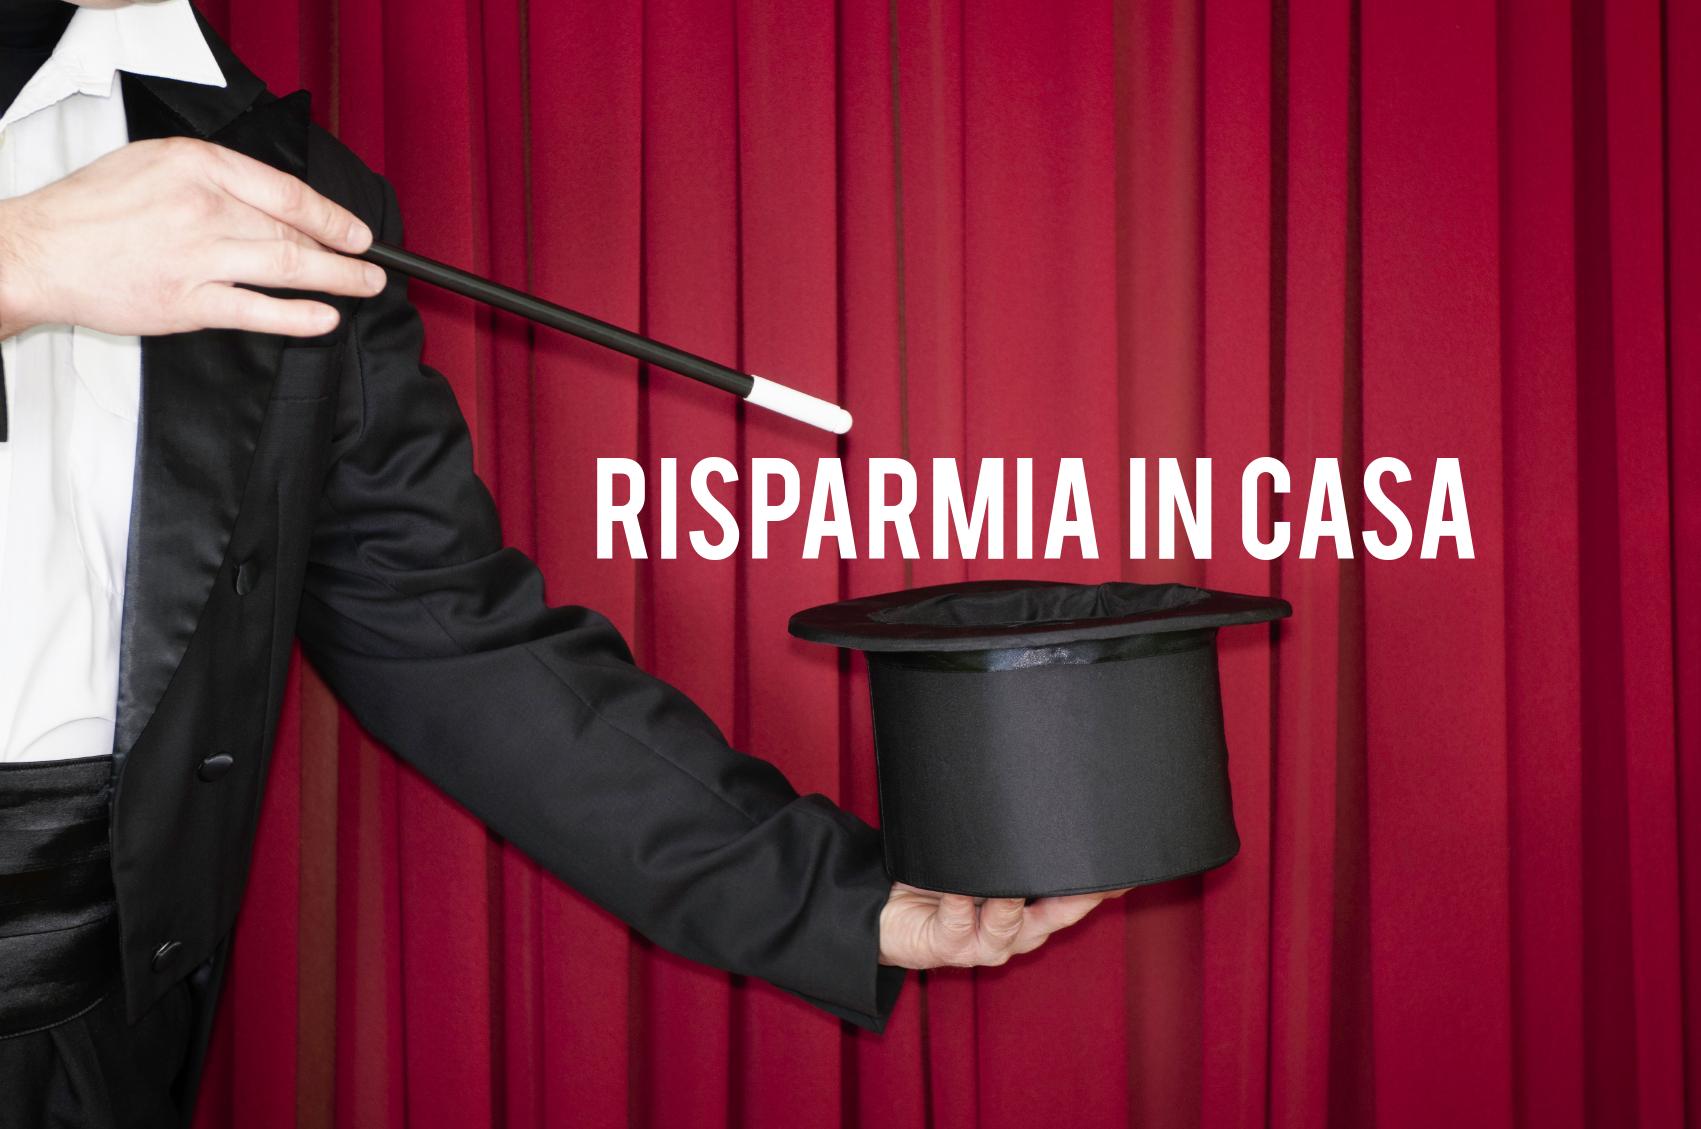 RISPARMIA IN CASA.jpg